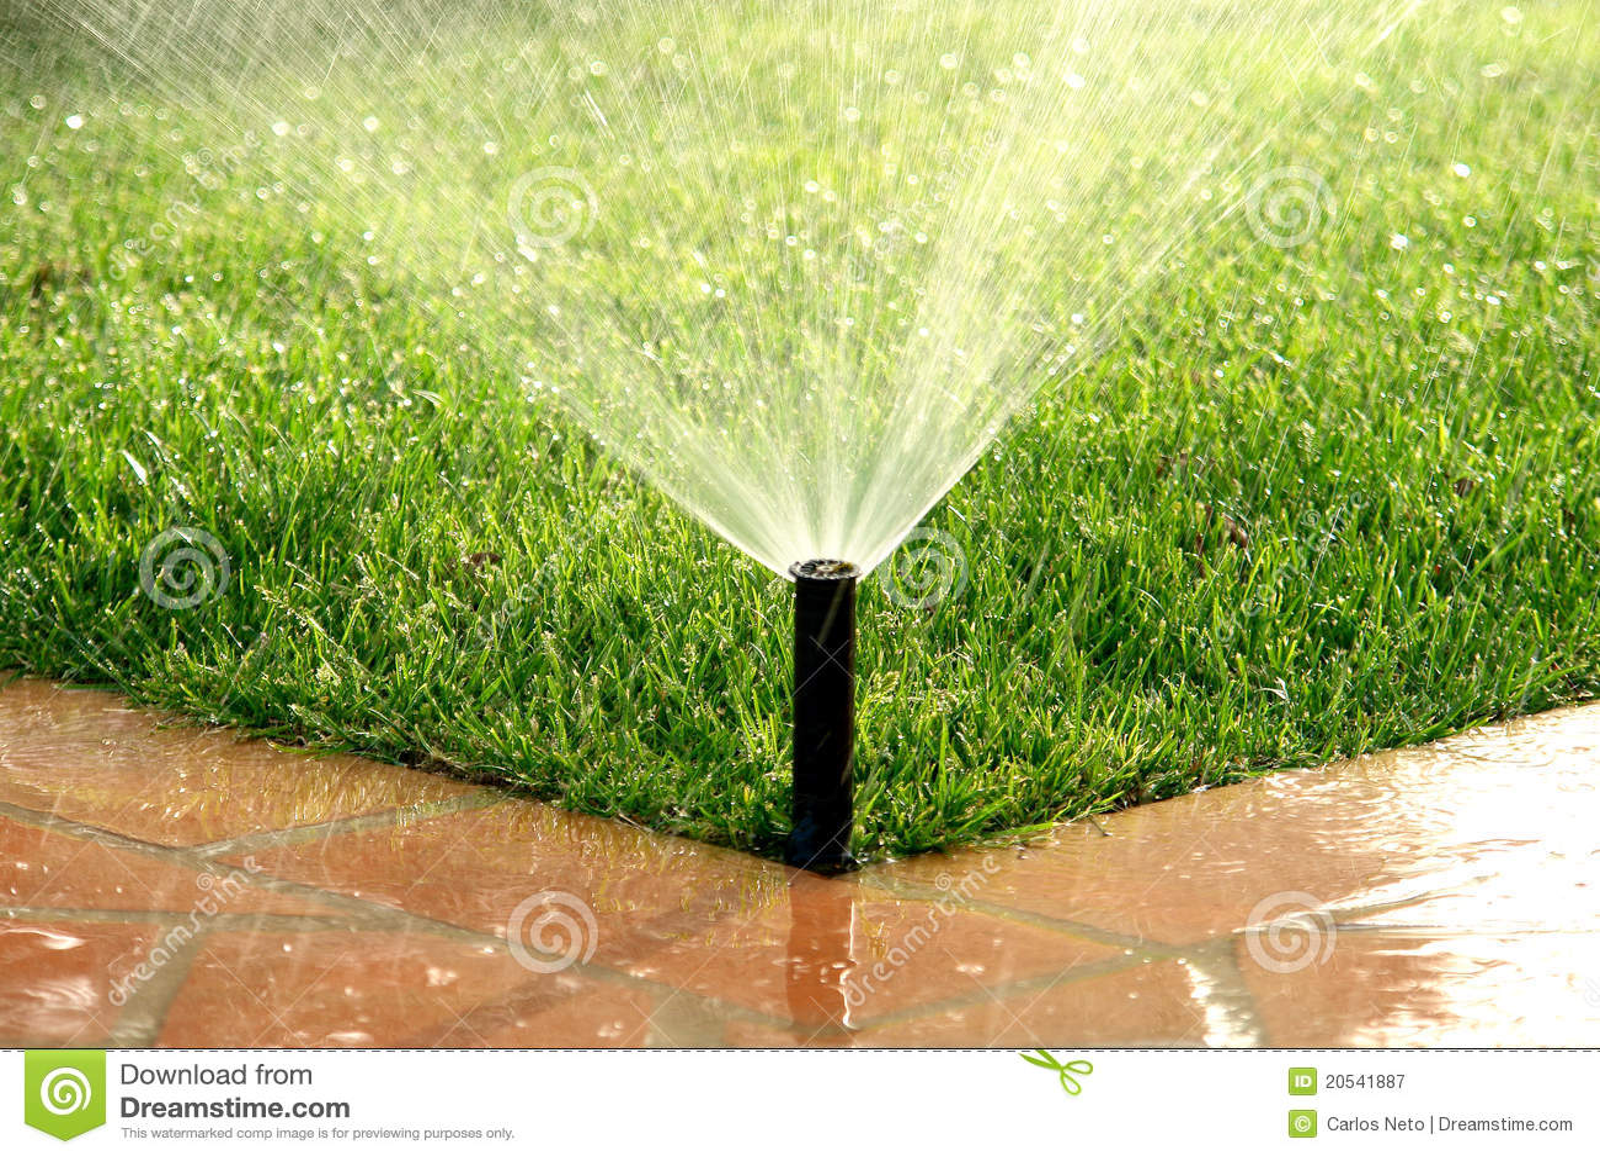 C sped de riego autom tico del sistema de irrigaci n del for Riego automatico jardin